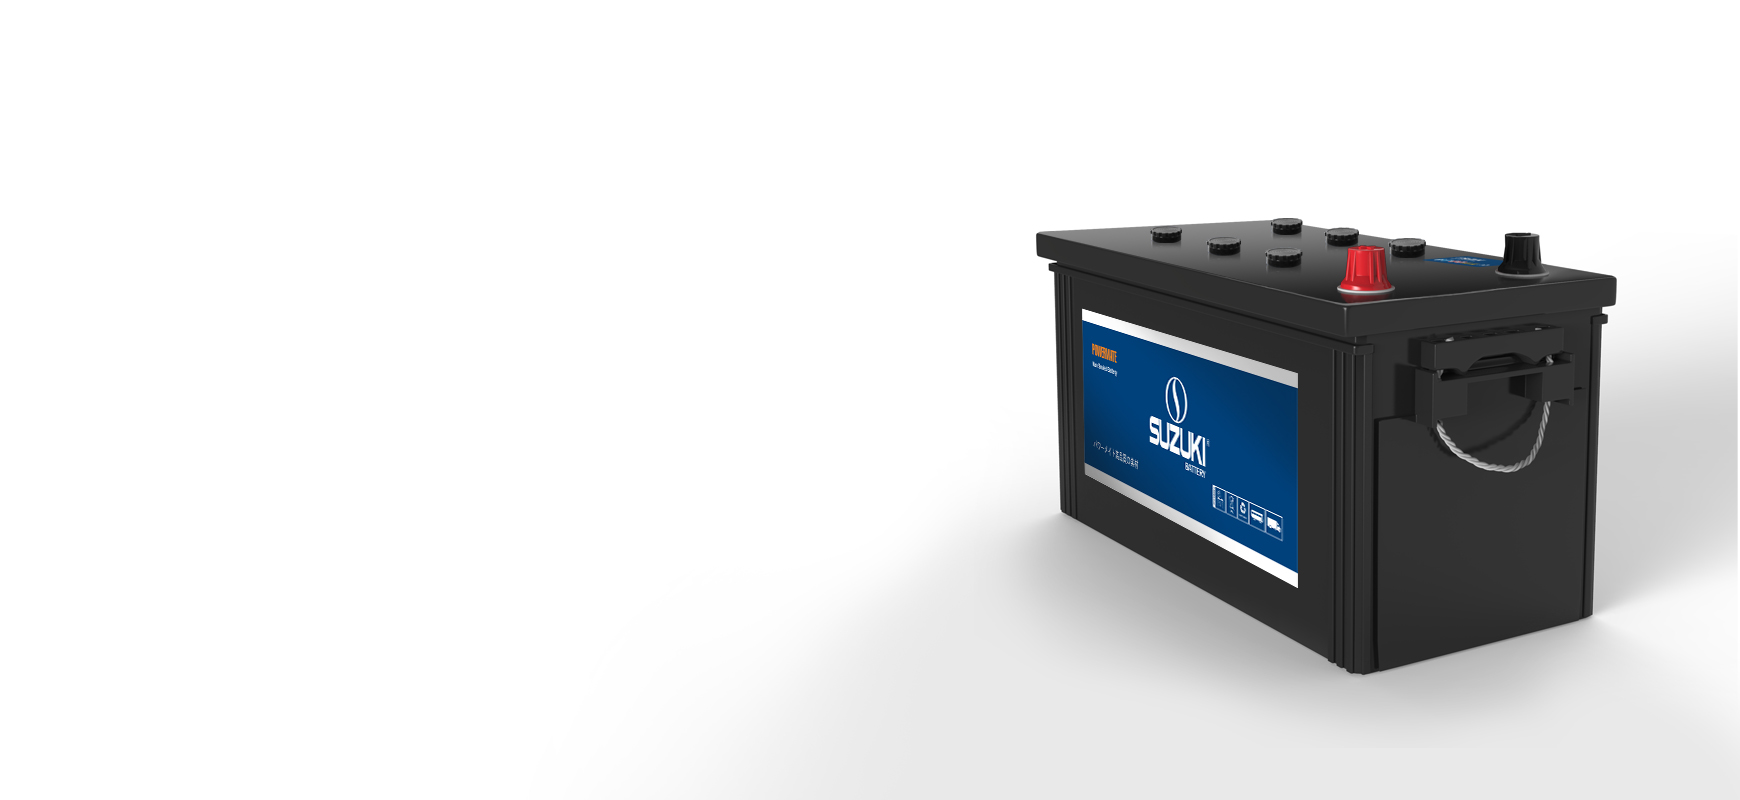 Suzuki Commercial (truck) starter battery Powermate series